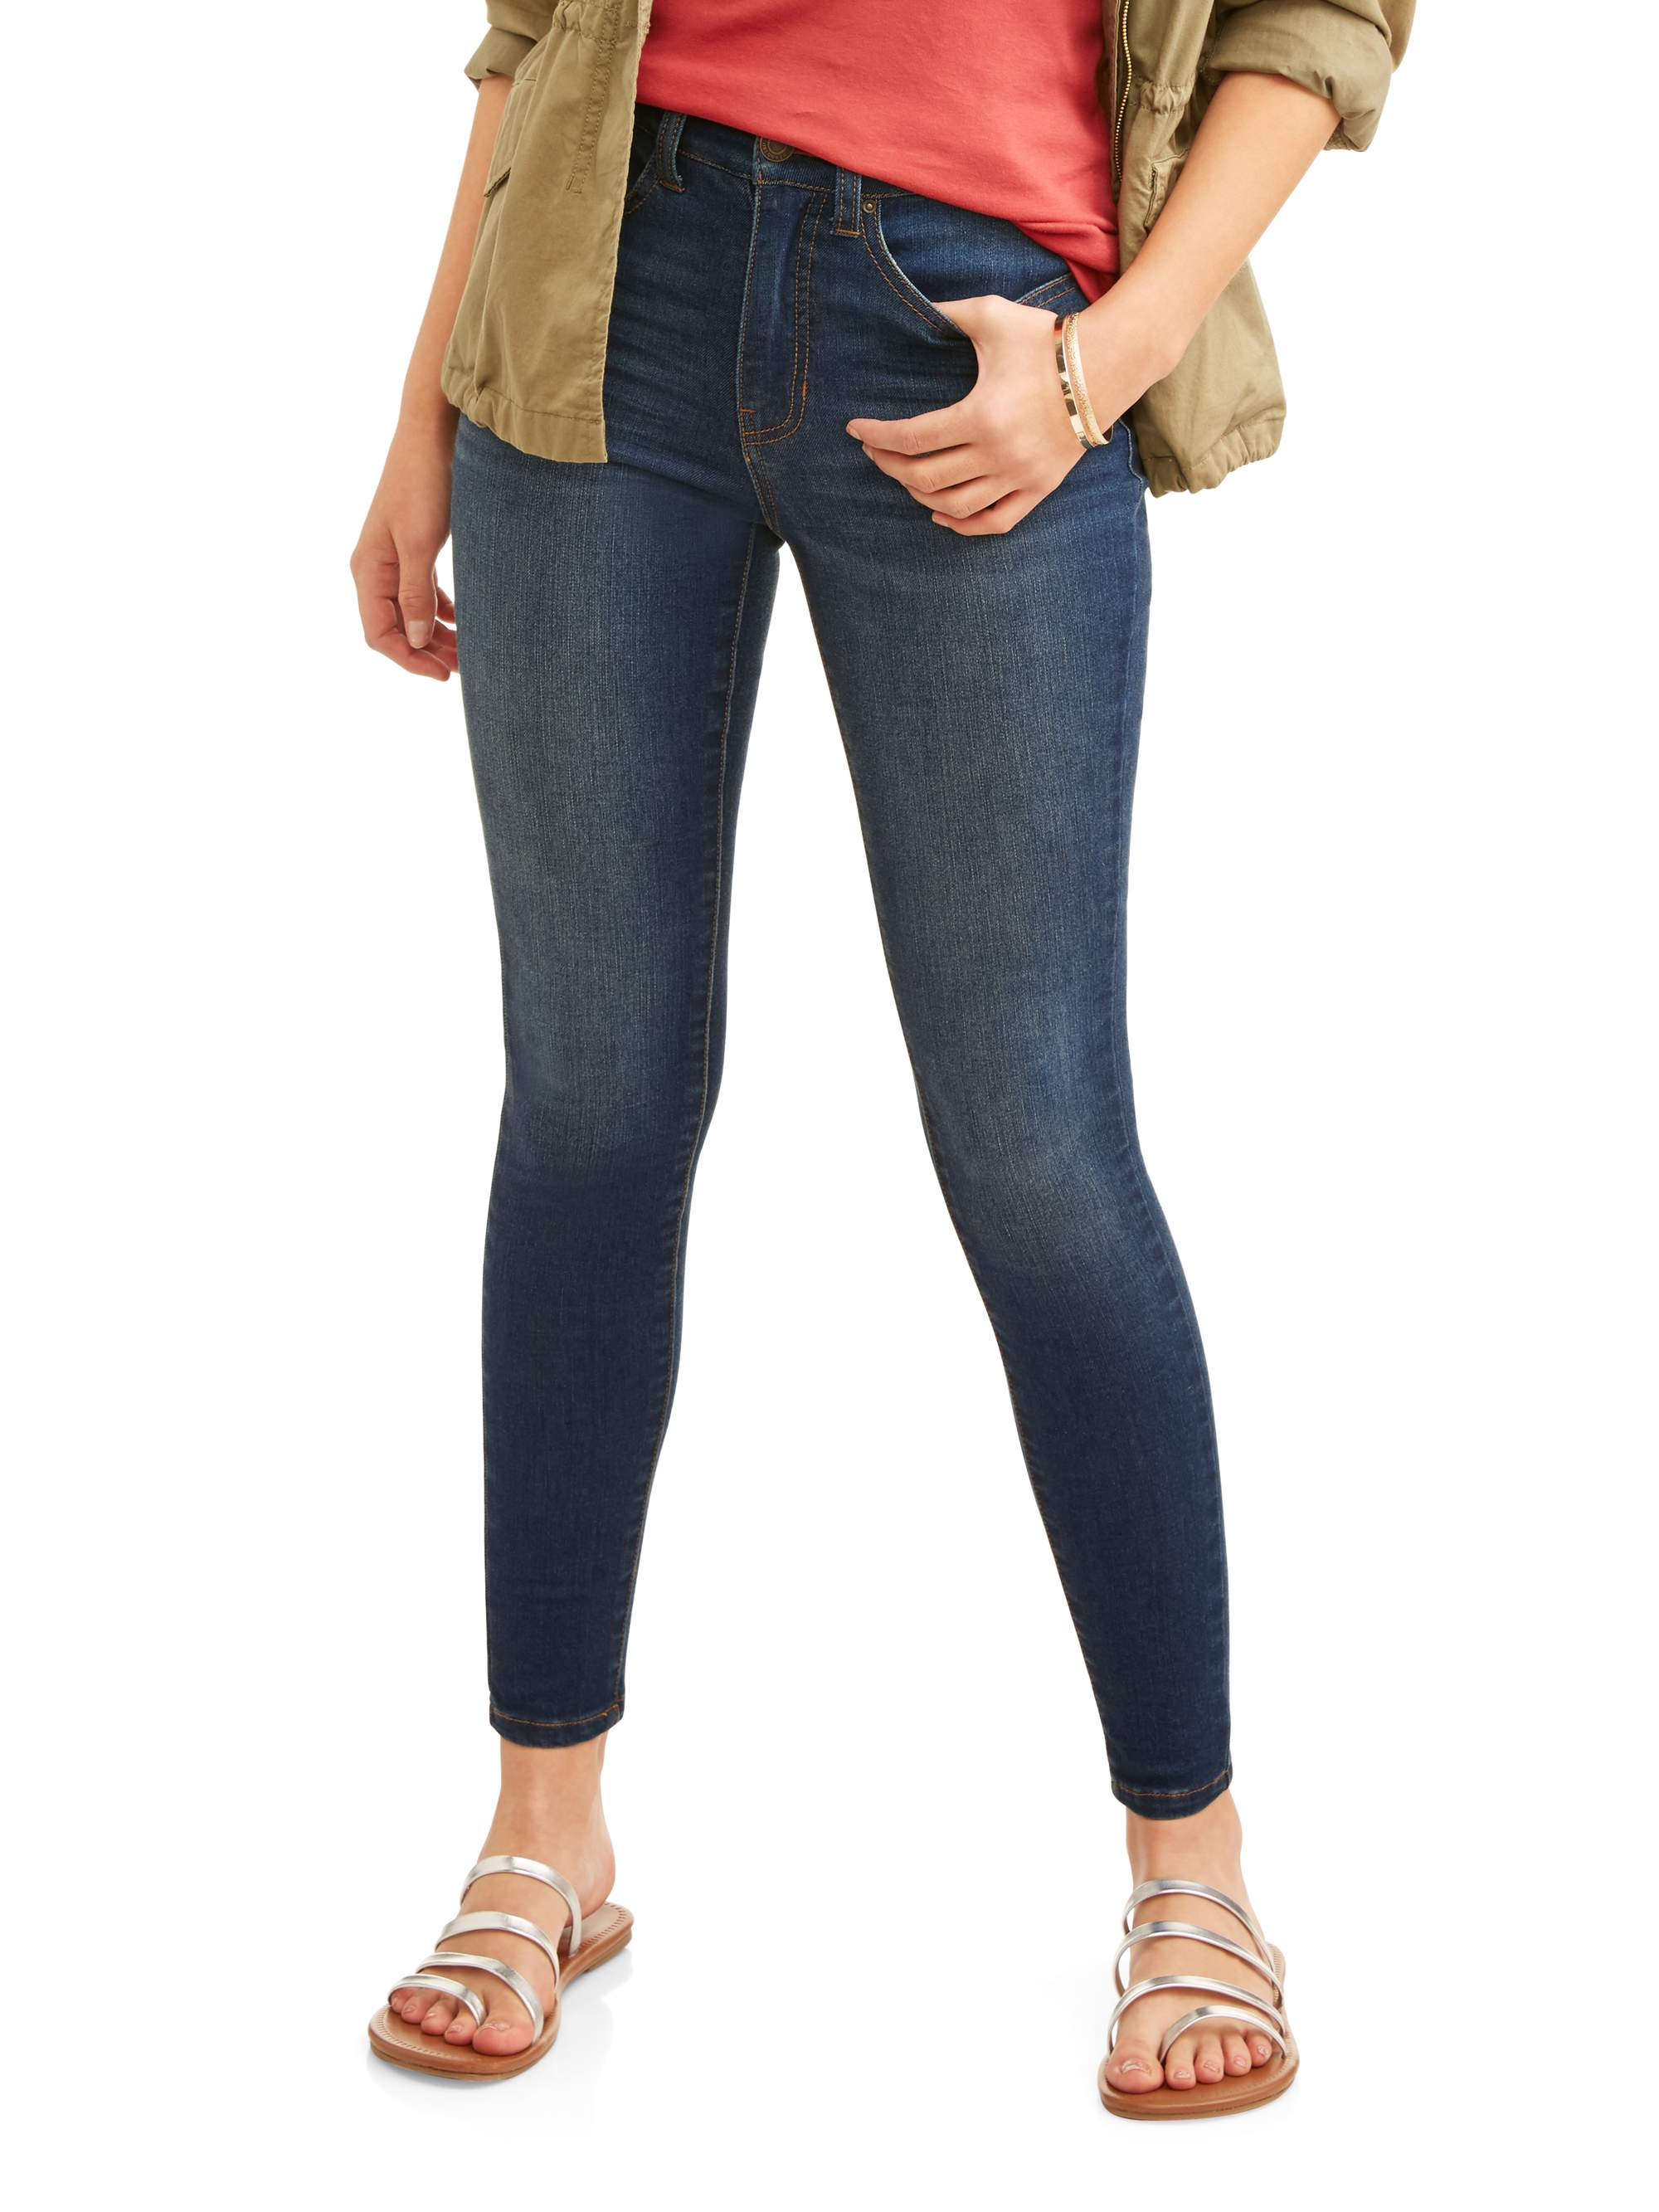 5915022a5dd Time and Tru - Time and Tru Women s Core High Rise Skinny Jean ...